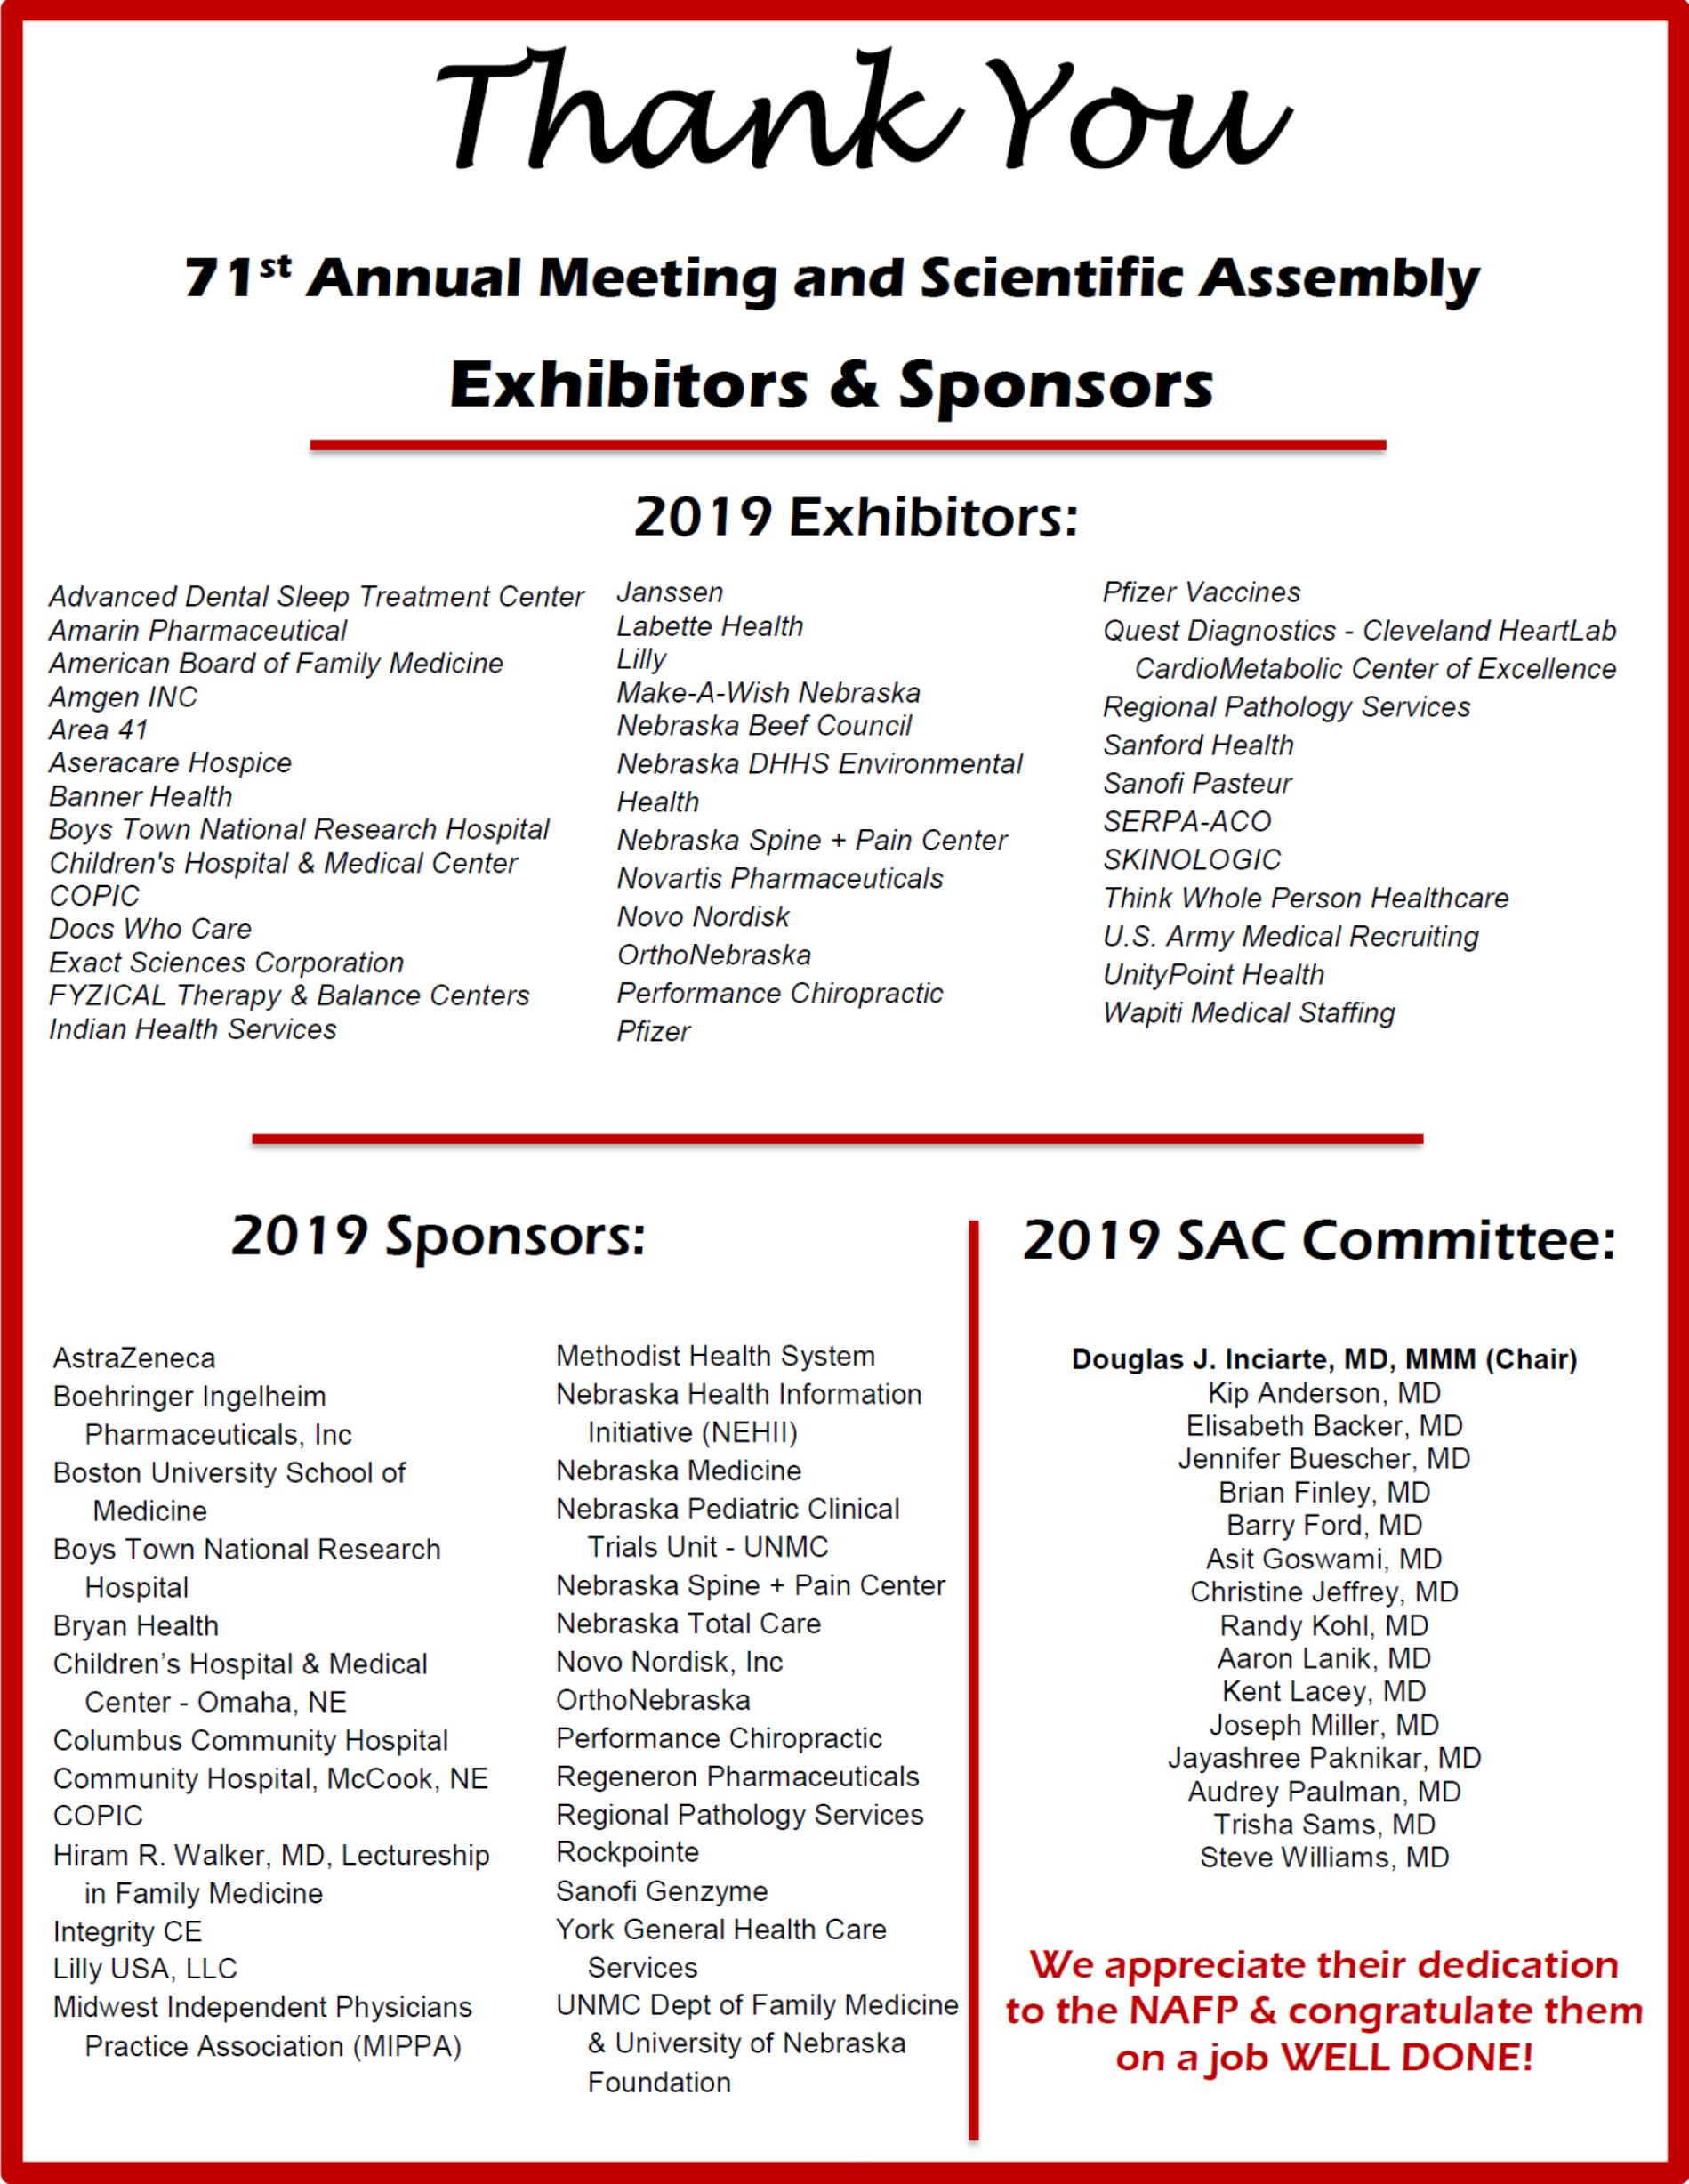 Thank You to ASA Exhibitors & Sponsors